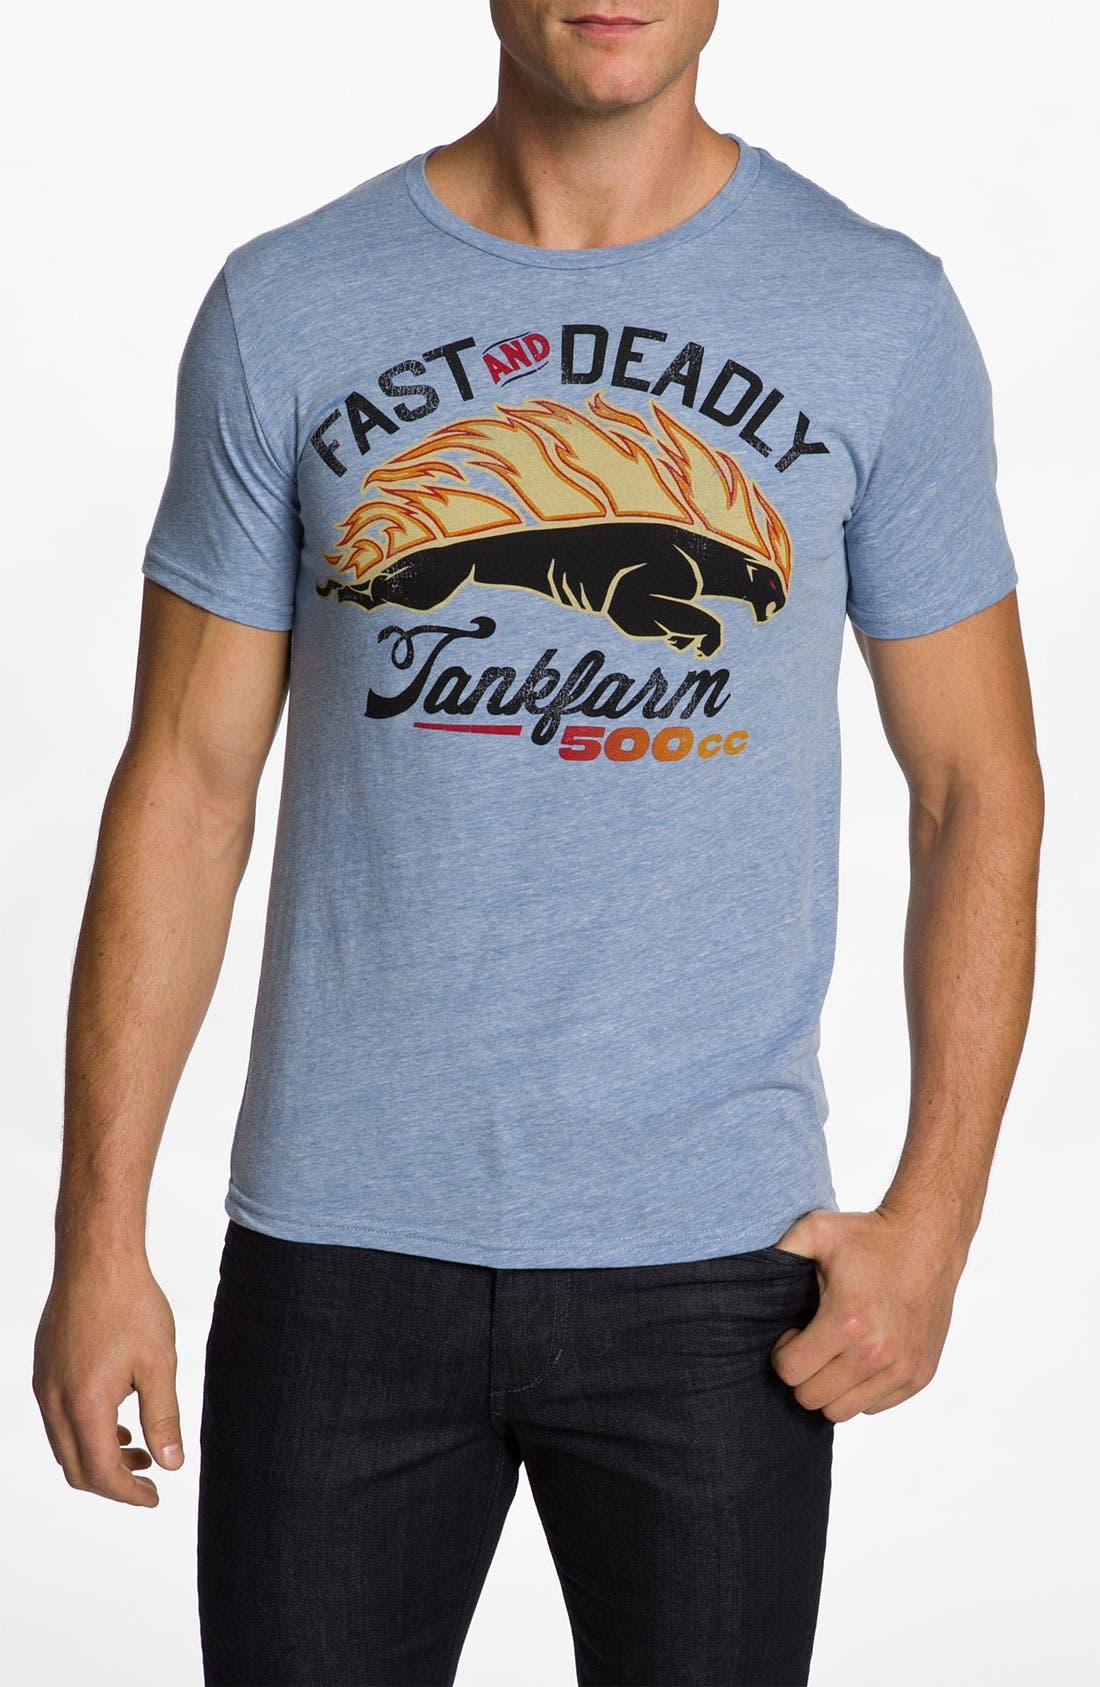 Alternate Image 1 Selected - Tankfarm 'Fast 500' T-Shirt